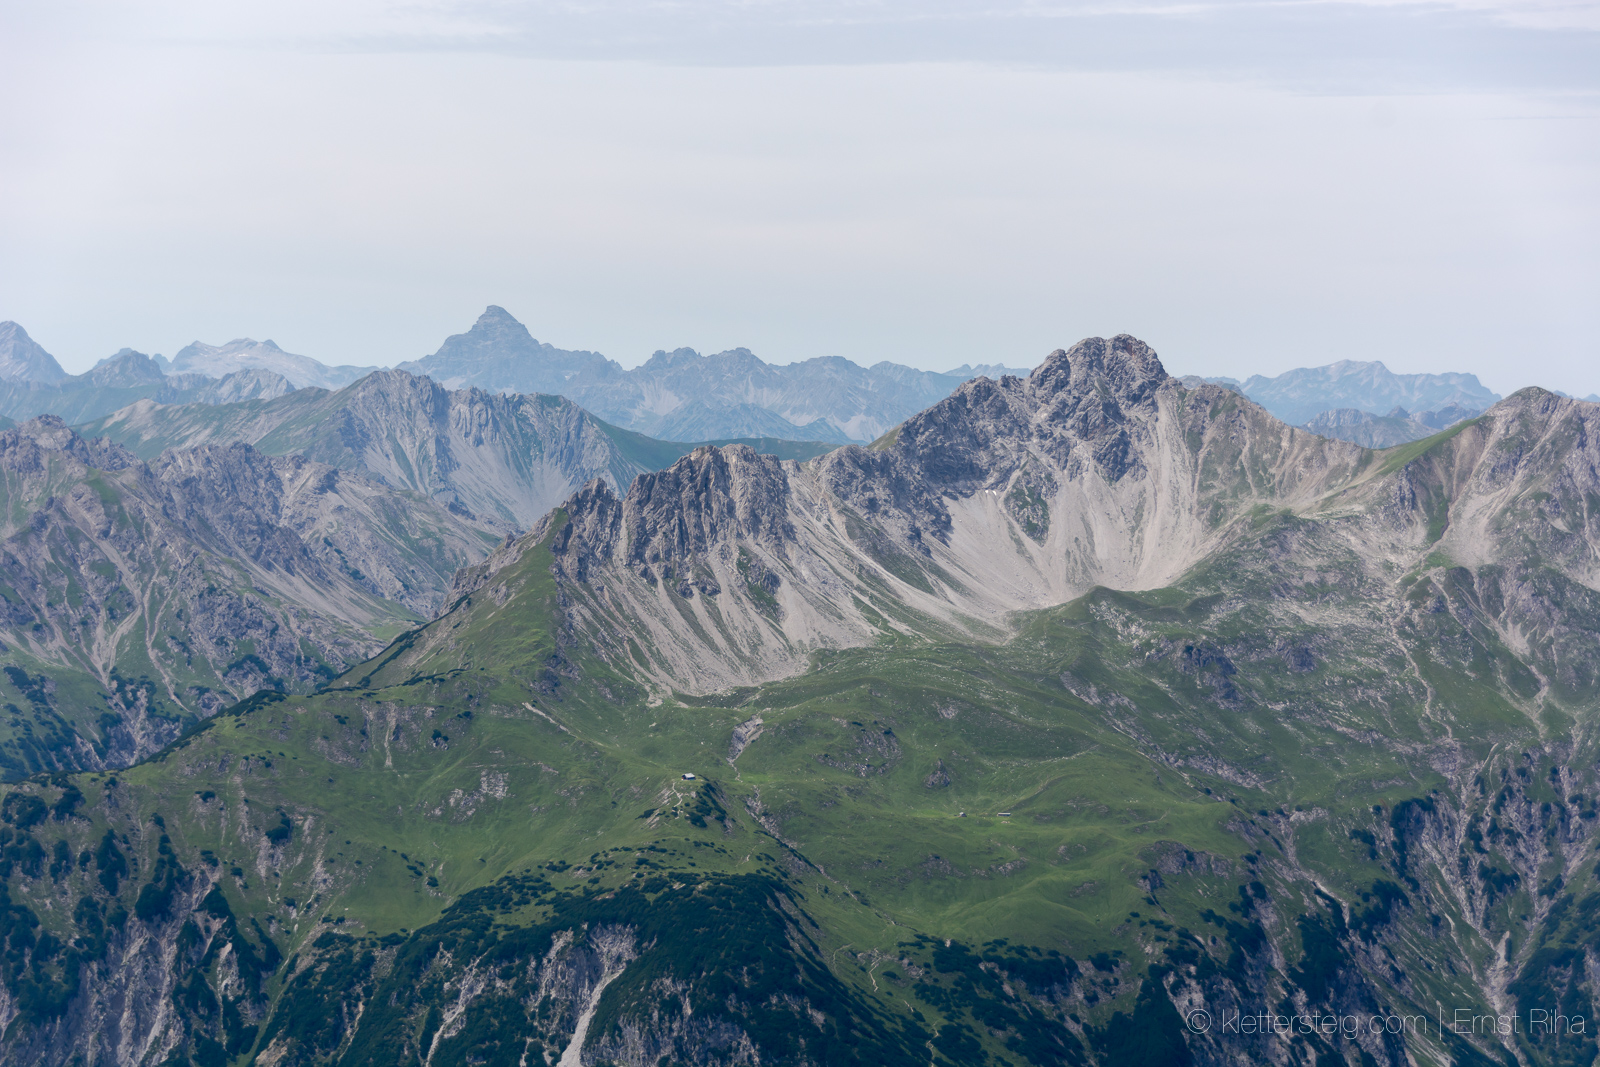 Klettersteig Nassereith : Panorama am loreakopf nassereith